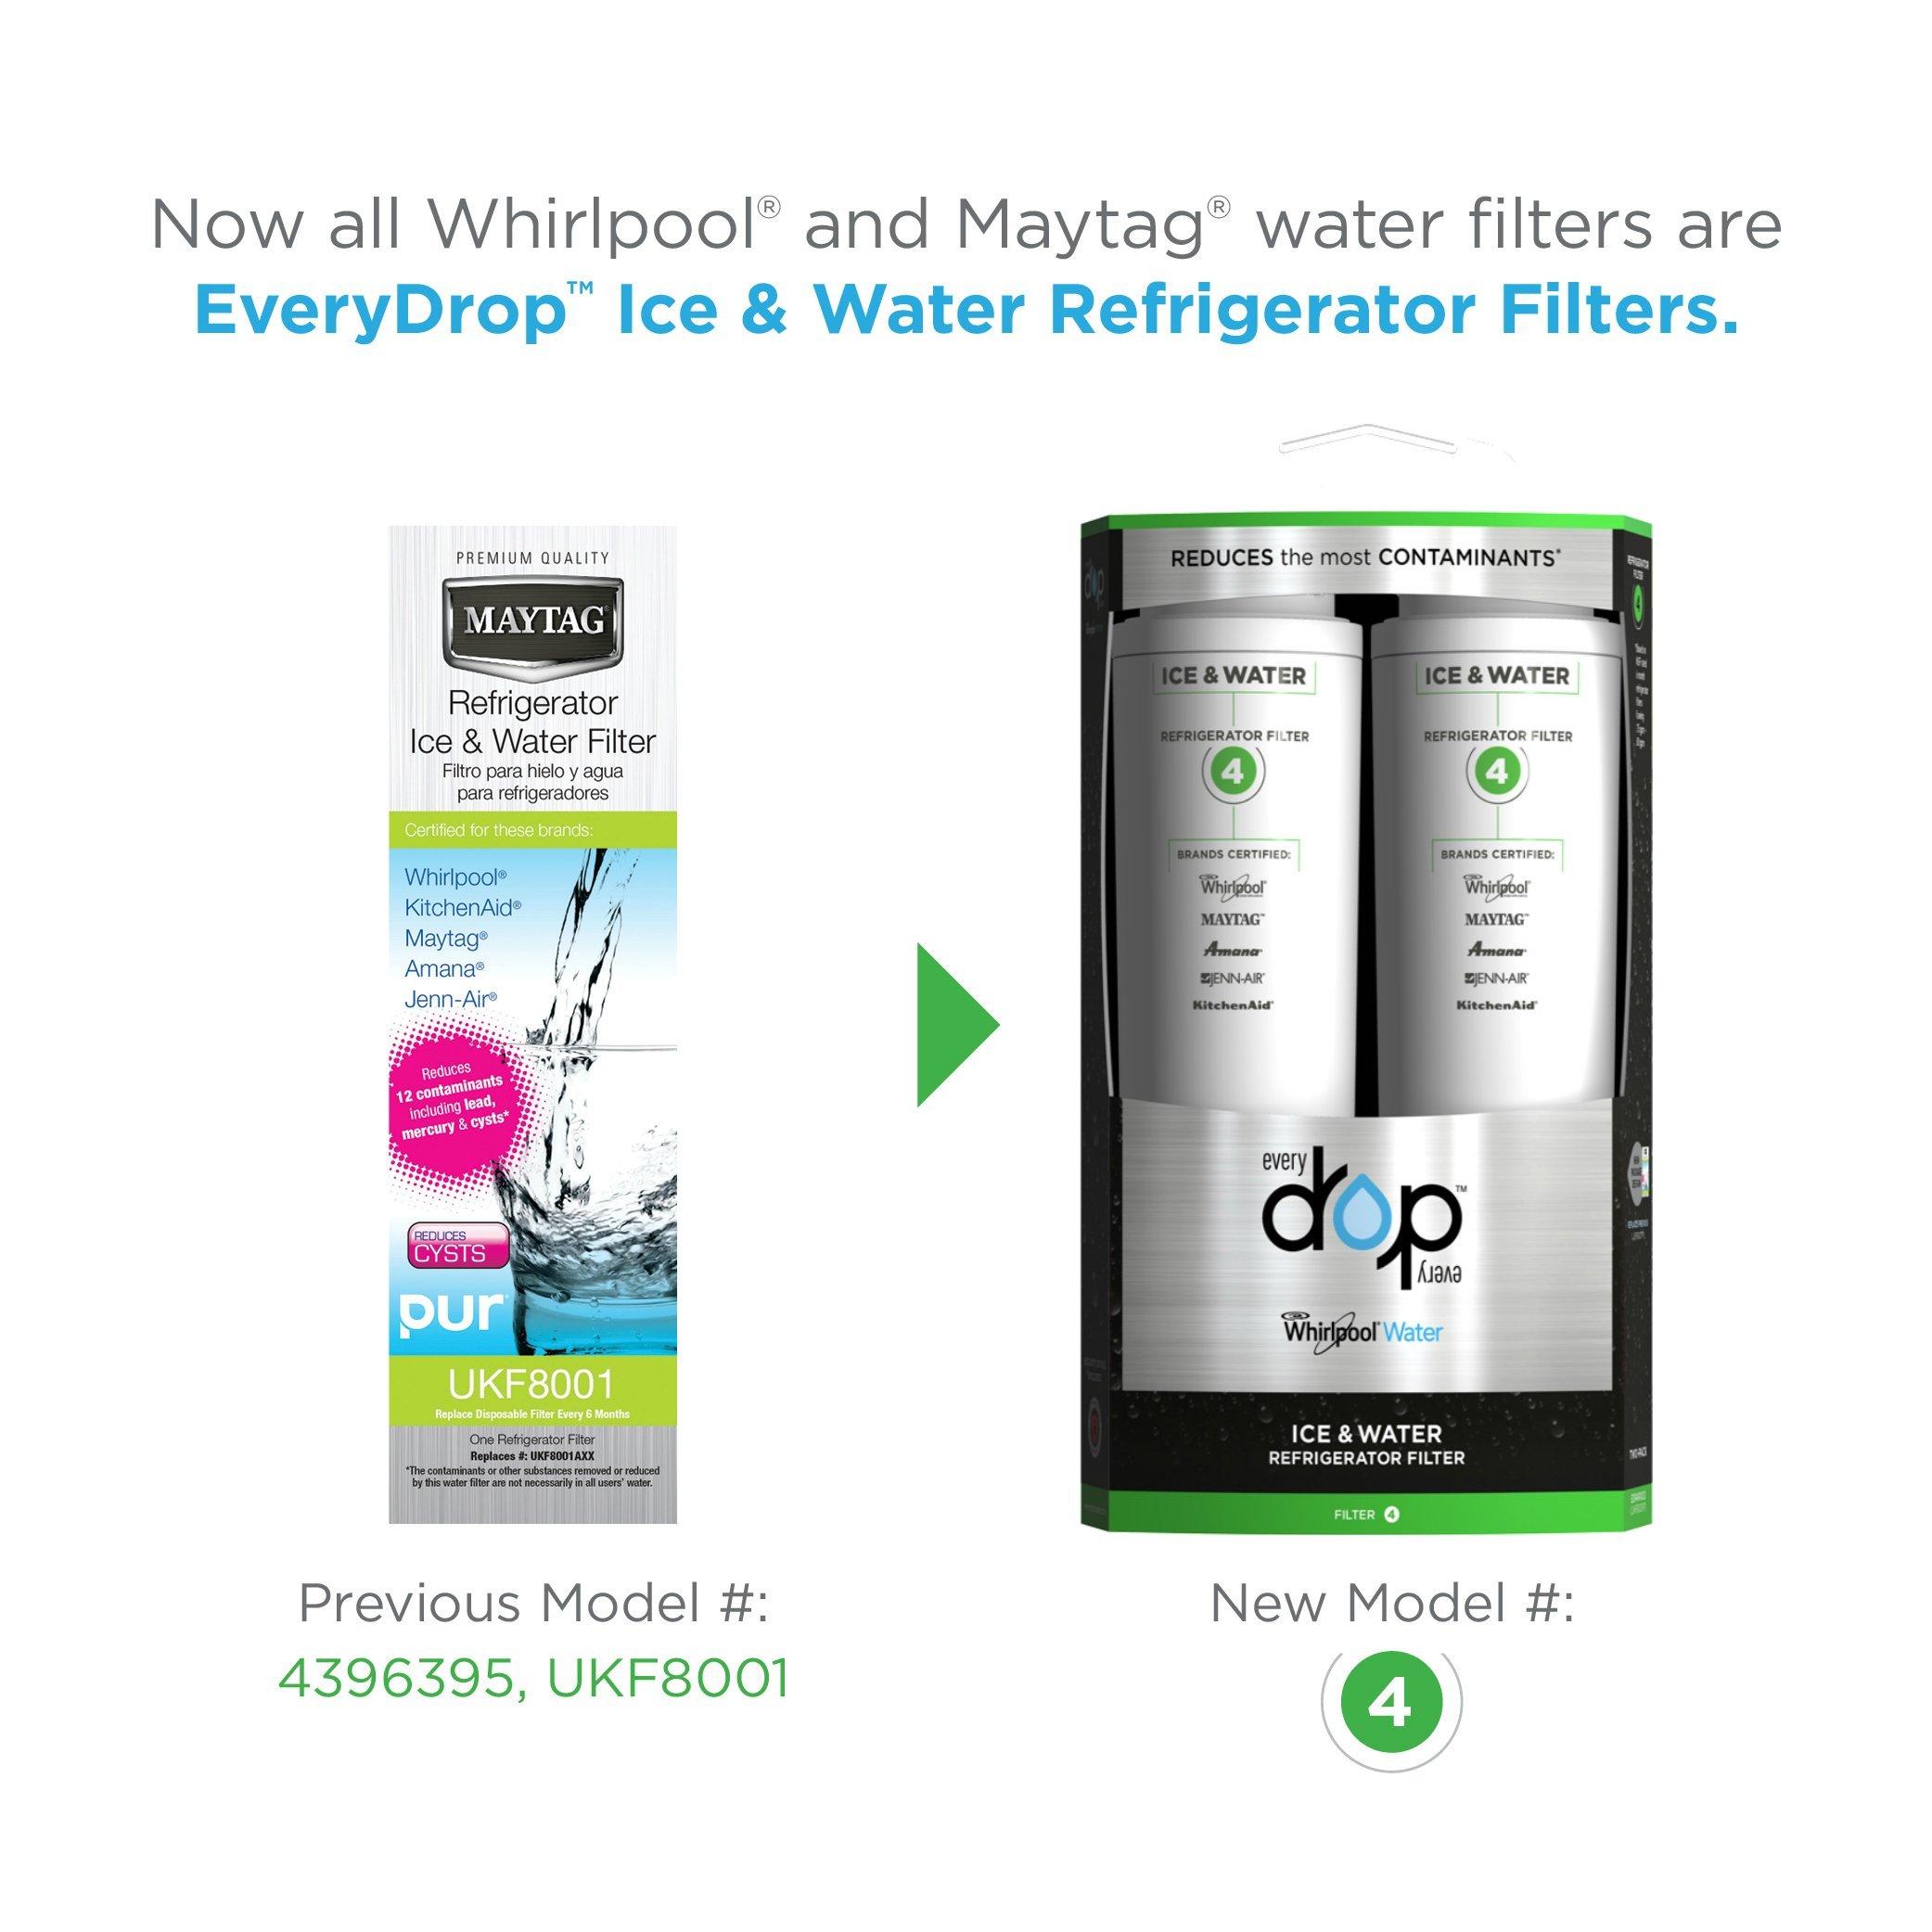 EveryDrop by Whirlpool Refrigerator Water Filter 4 (Pack of 2) by EveryDrop by Whirlpool (Image #2)